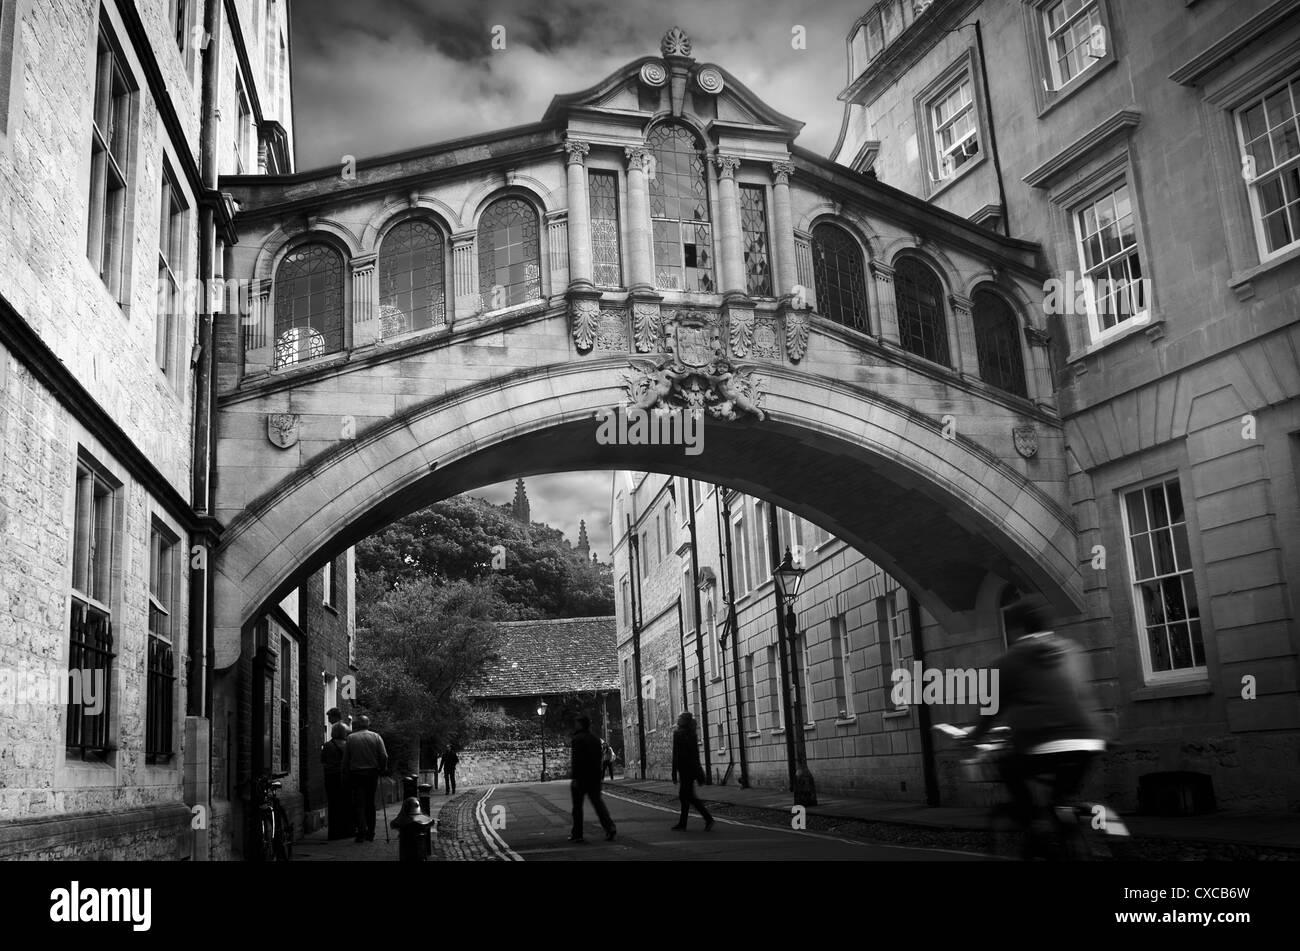 Hertford College (Oxford). Bridge of Sighs (Hertford Bridge) over new college lane, inspired by the Rialto Bridge, - Stock Image